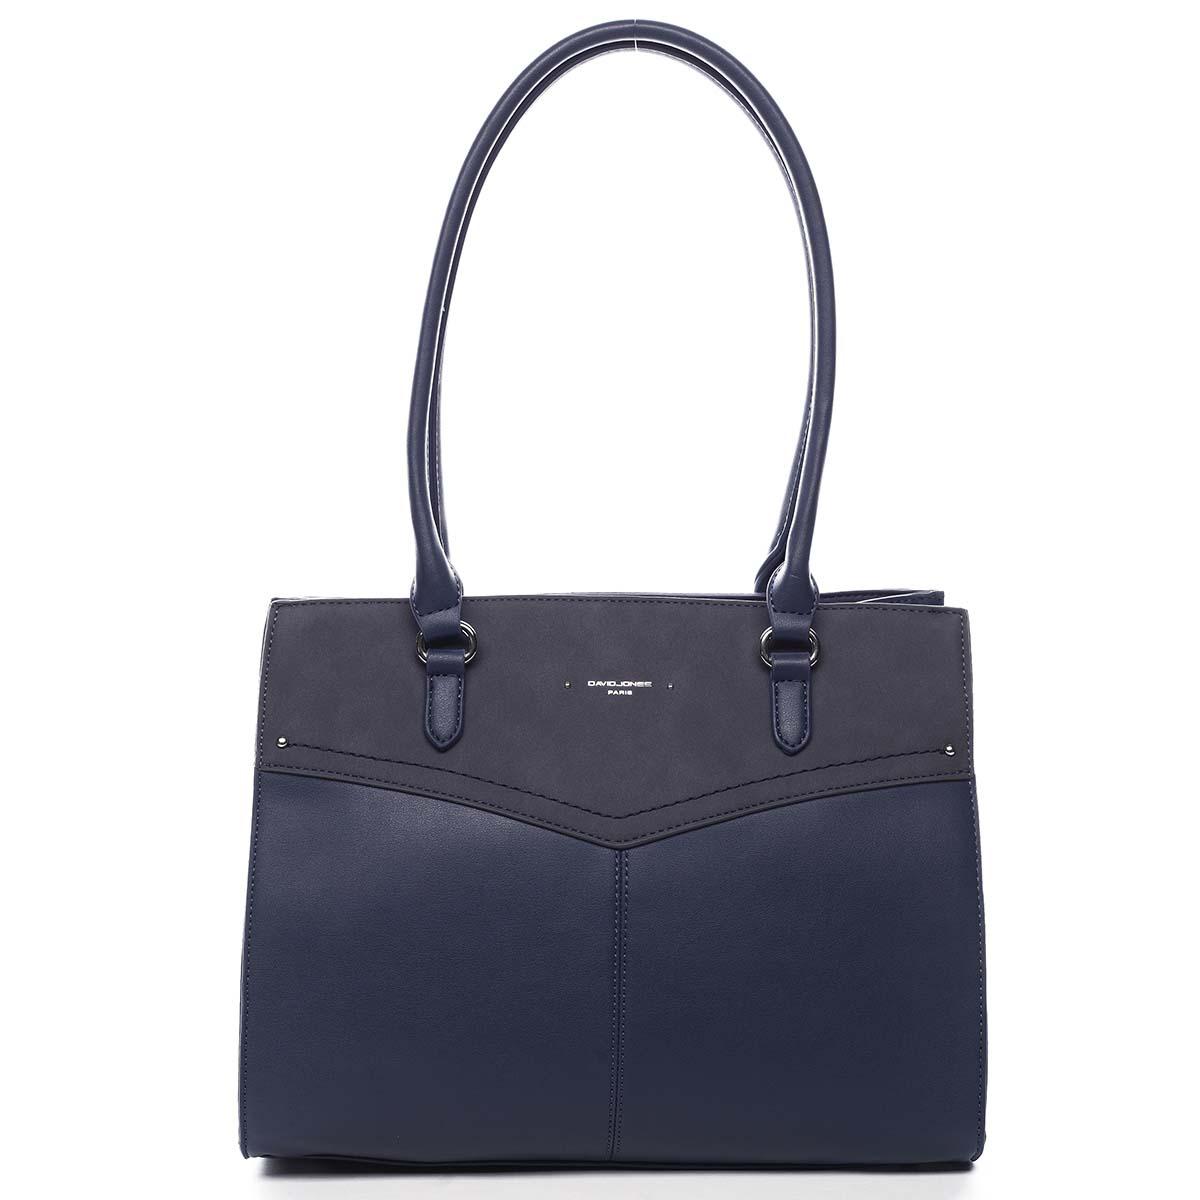 Dámska kabelka cez rameno tmavo modrá - David Jones Renesme tmavo modra